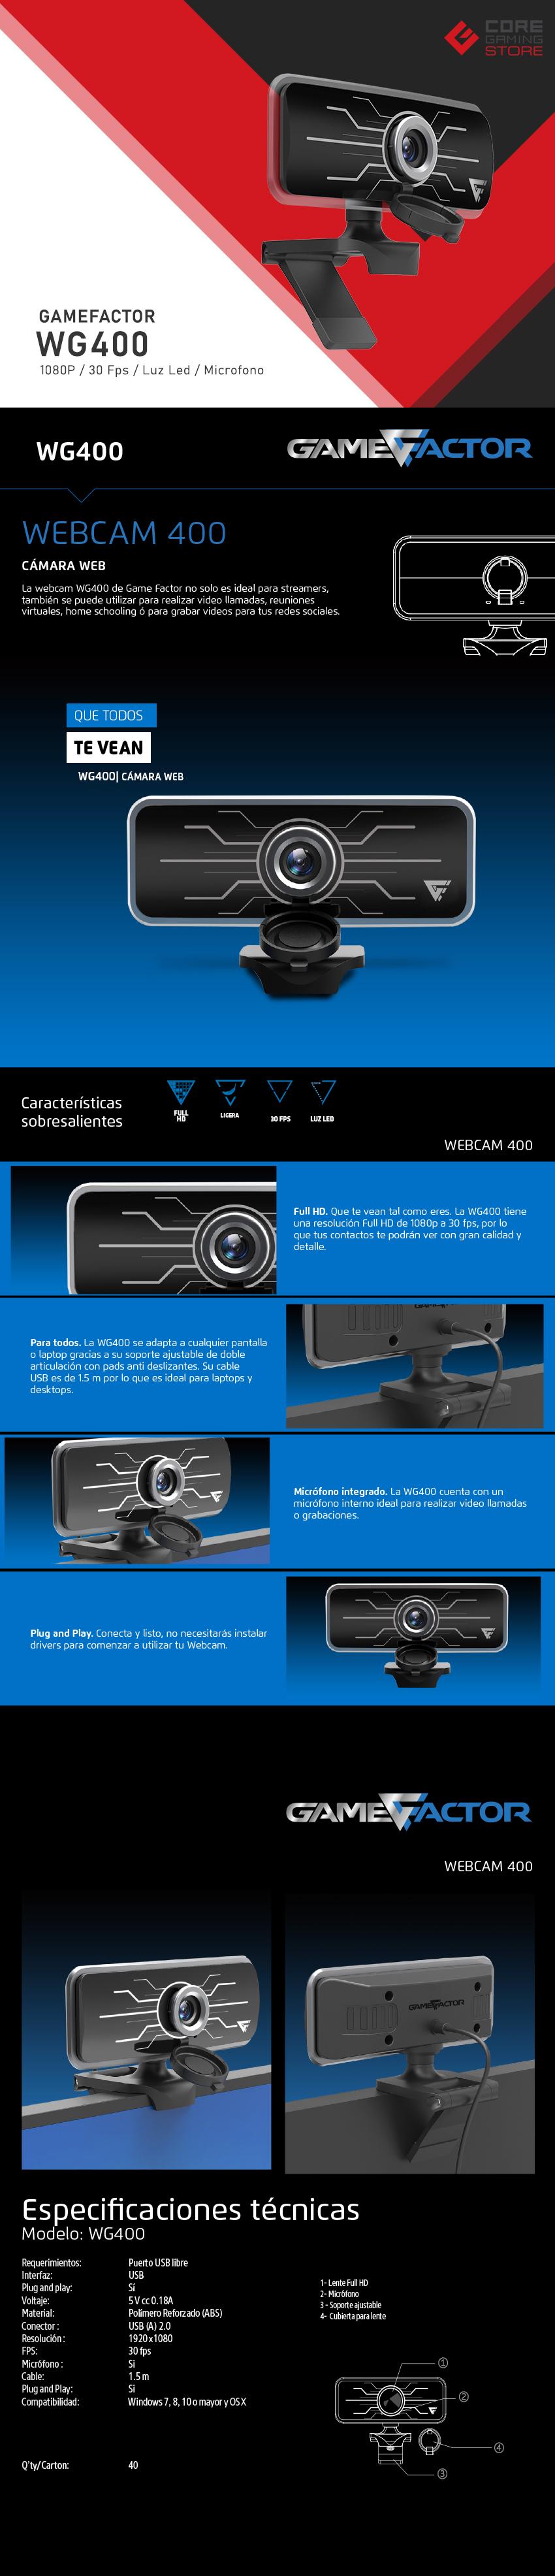 Camara Web GameFactor WG400, Full HD, Luz Led, Microfono - WG400